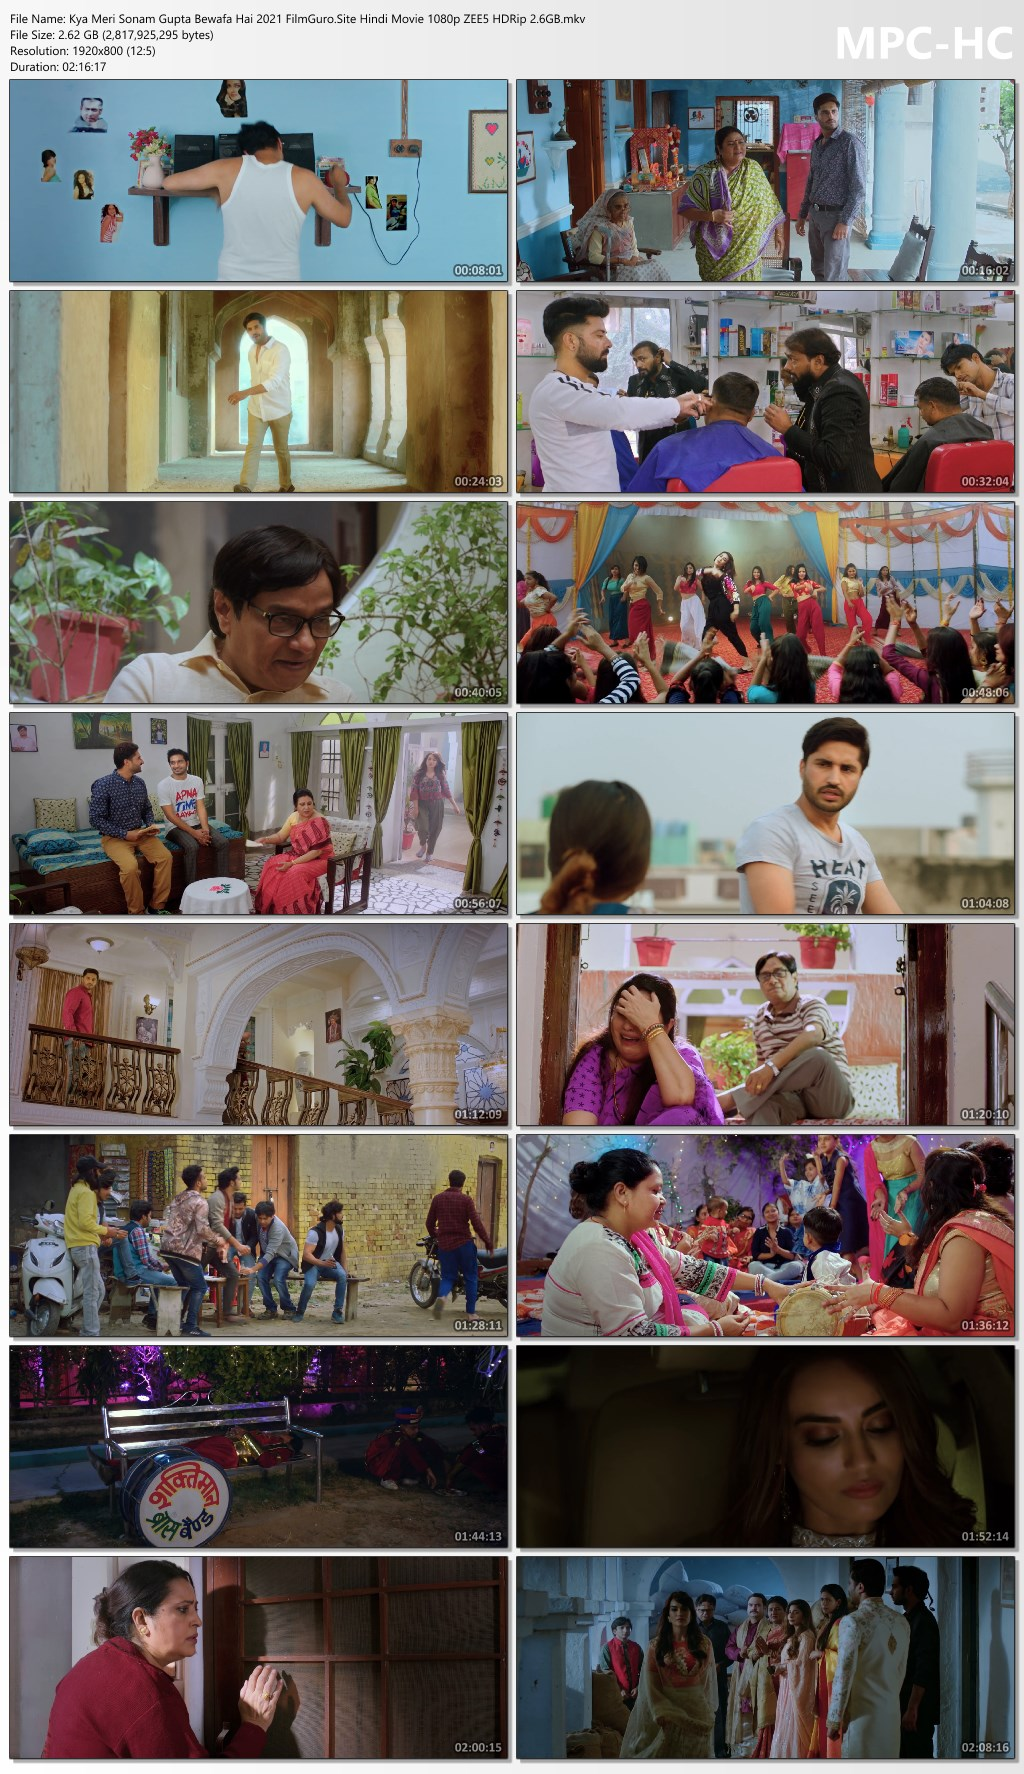 Kya-Meri-Sonam-Gupta-Bewafa-Hai-2021-Film-Guro-Site-Hindi-Movie-1080p-ZEE5-HDRip-2-6-GB-mkv-thumbs